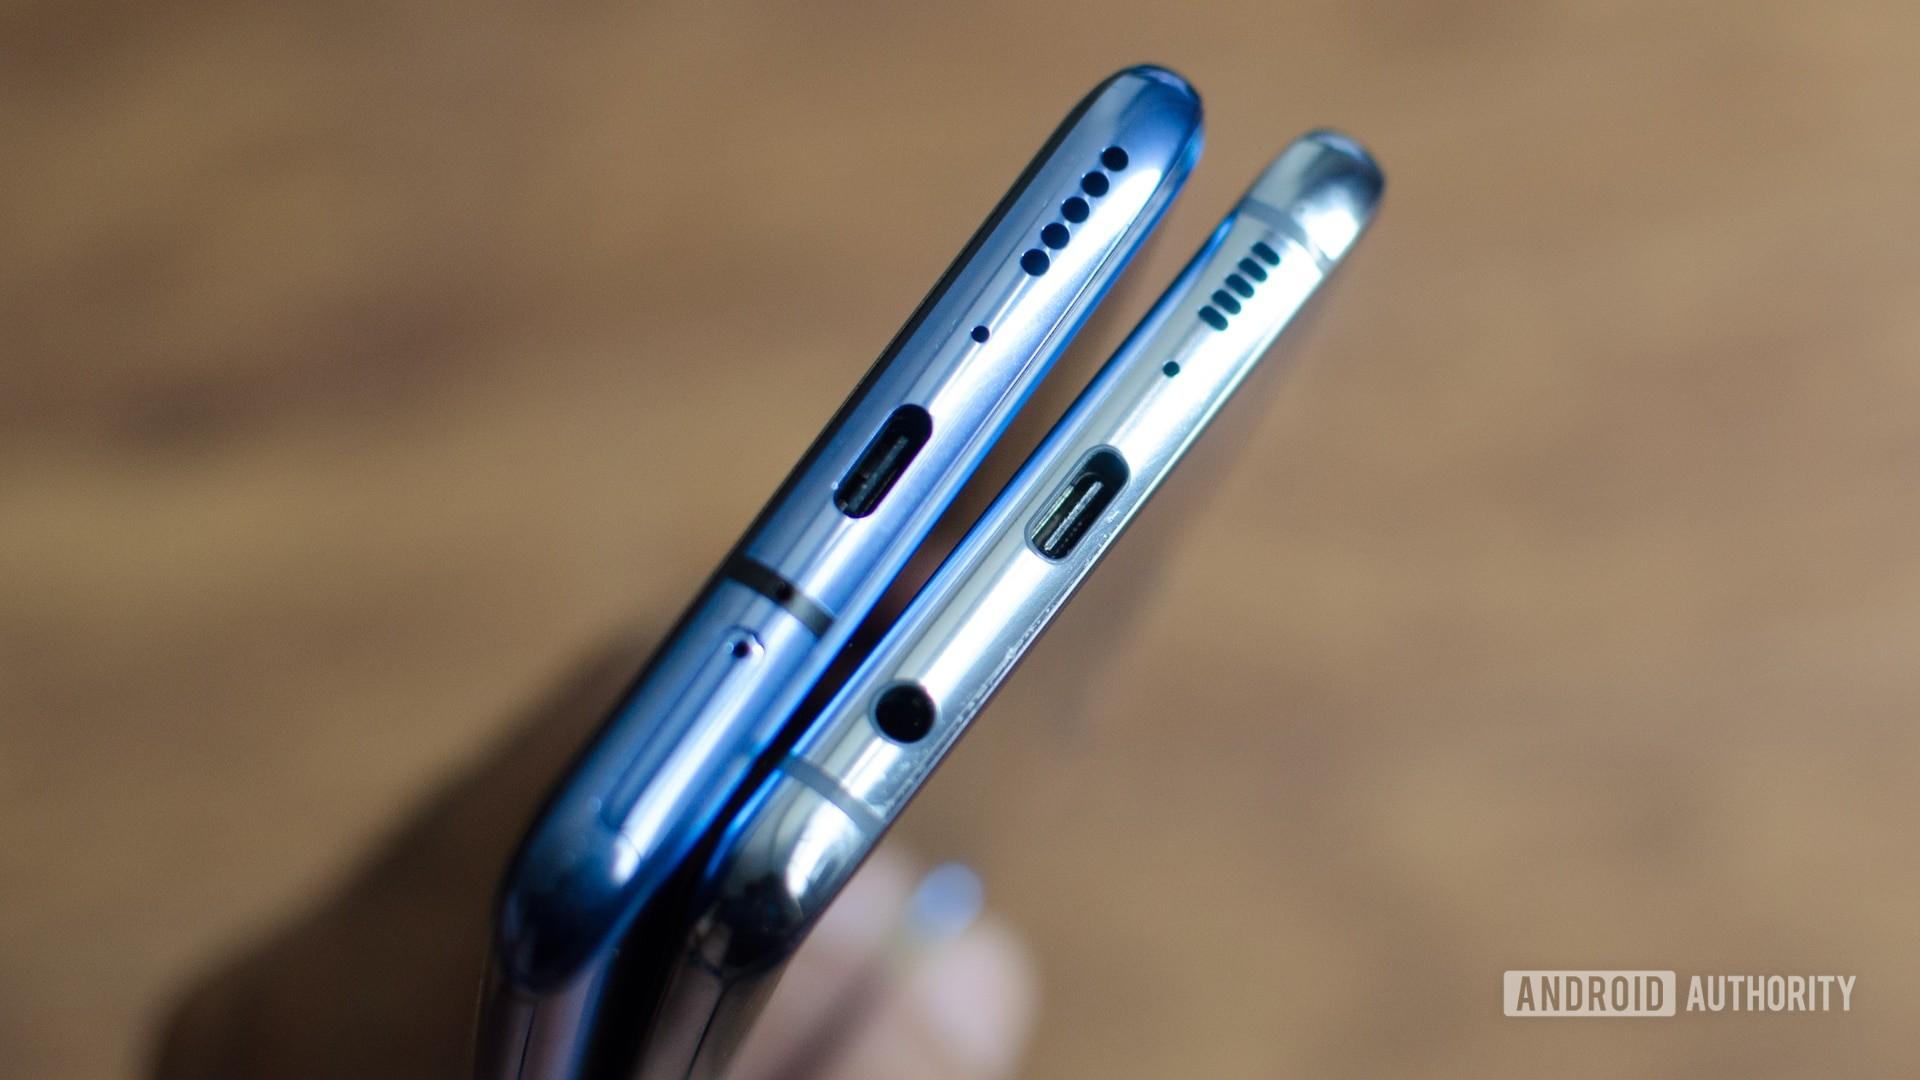 OnePlus 7 Pro vs Galaxy S10 Plus USB C port and headphone jack